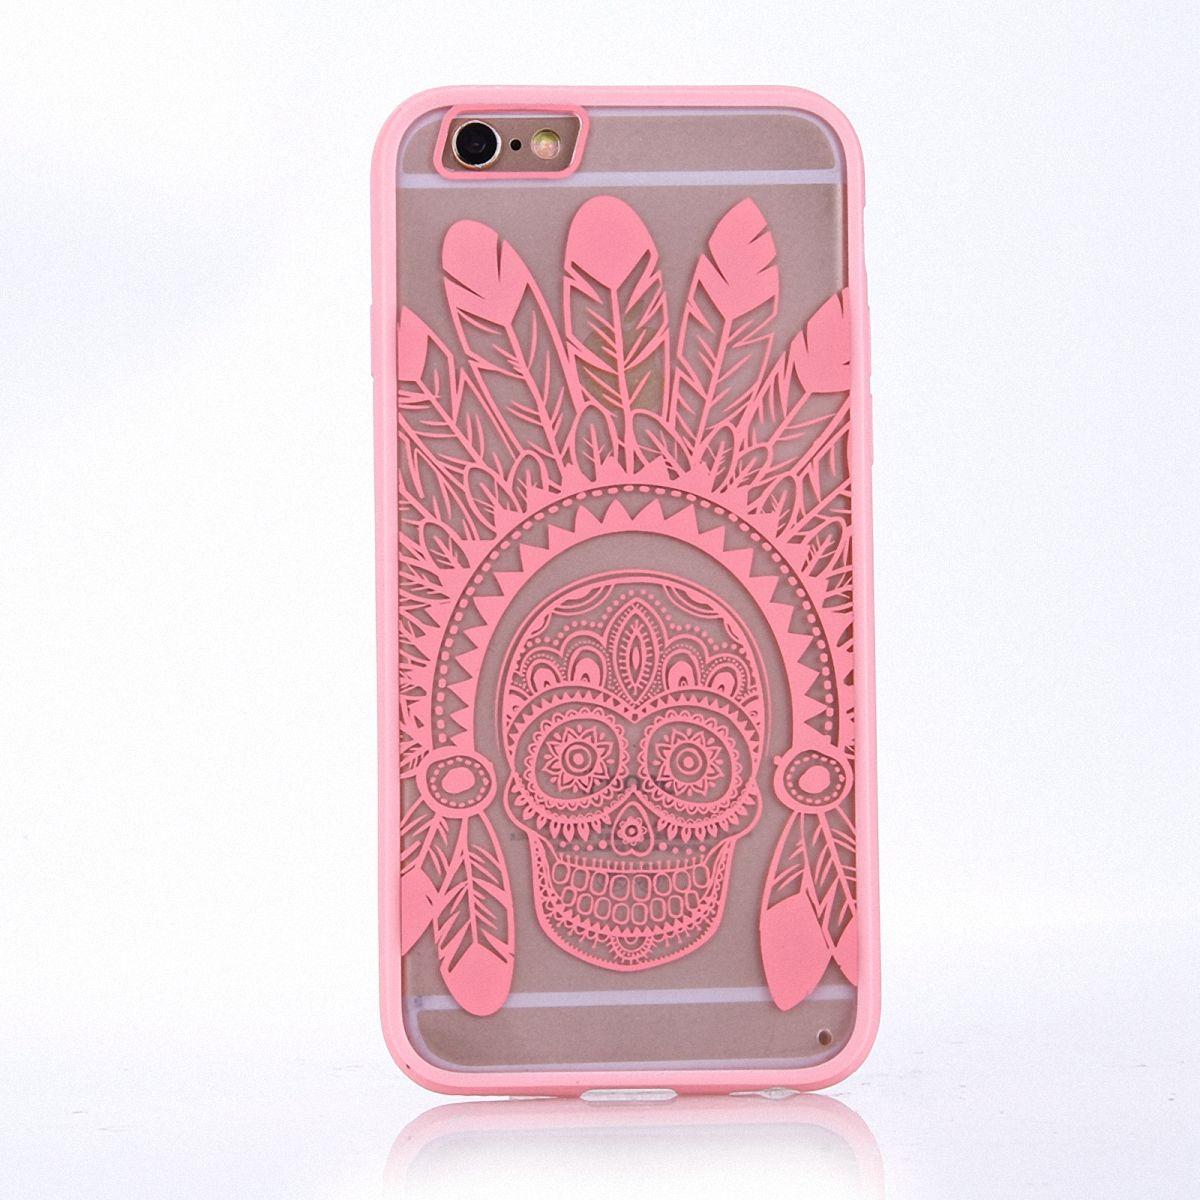 Handy Hülle Mandala für Apple iPhone SE 2020 Design Case Schutzhülle Motiv Federn Totenkopf Cover Tasche Bumper Rosa